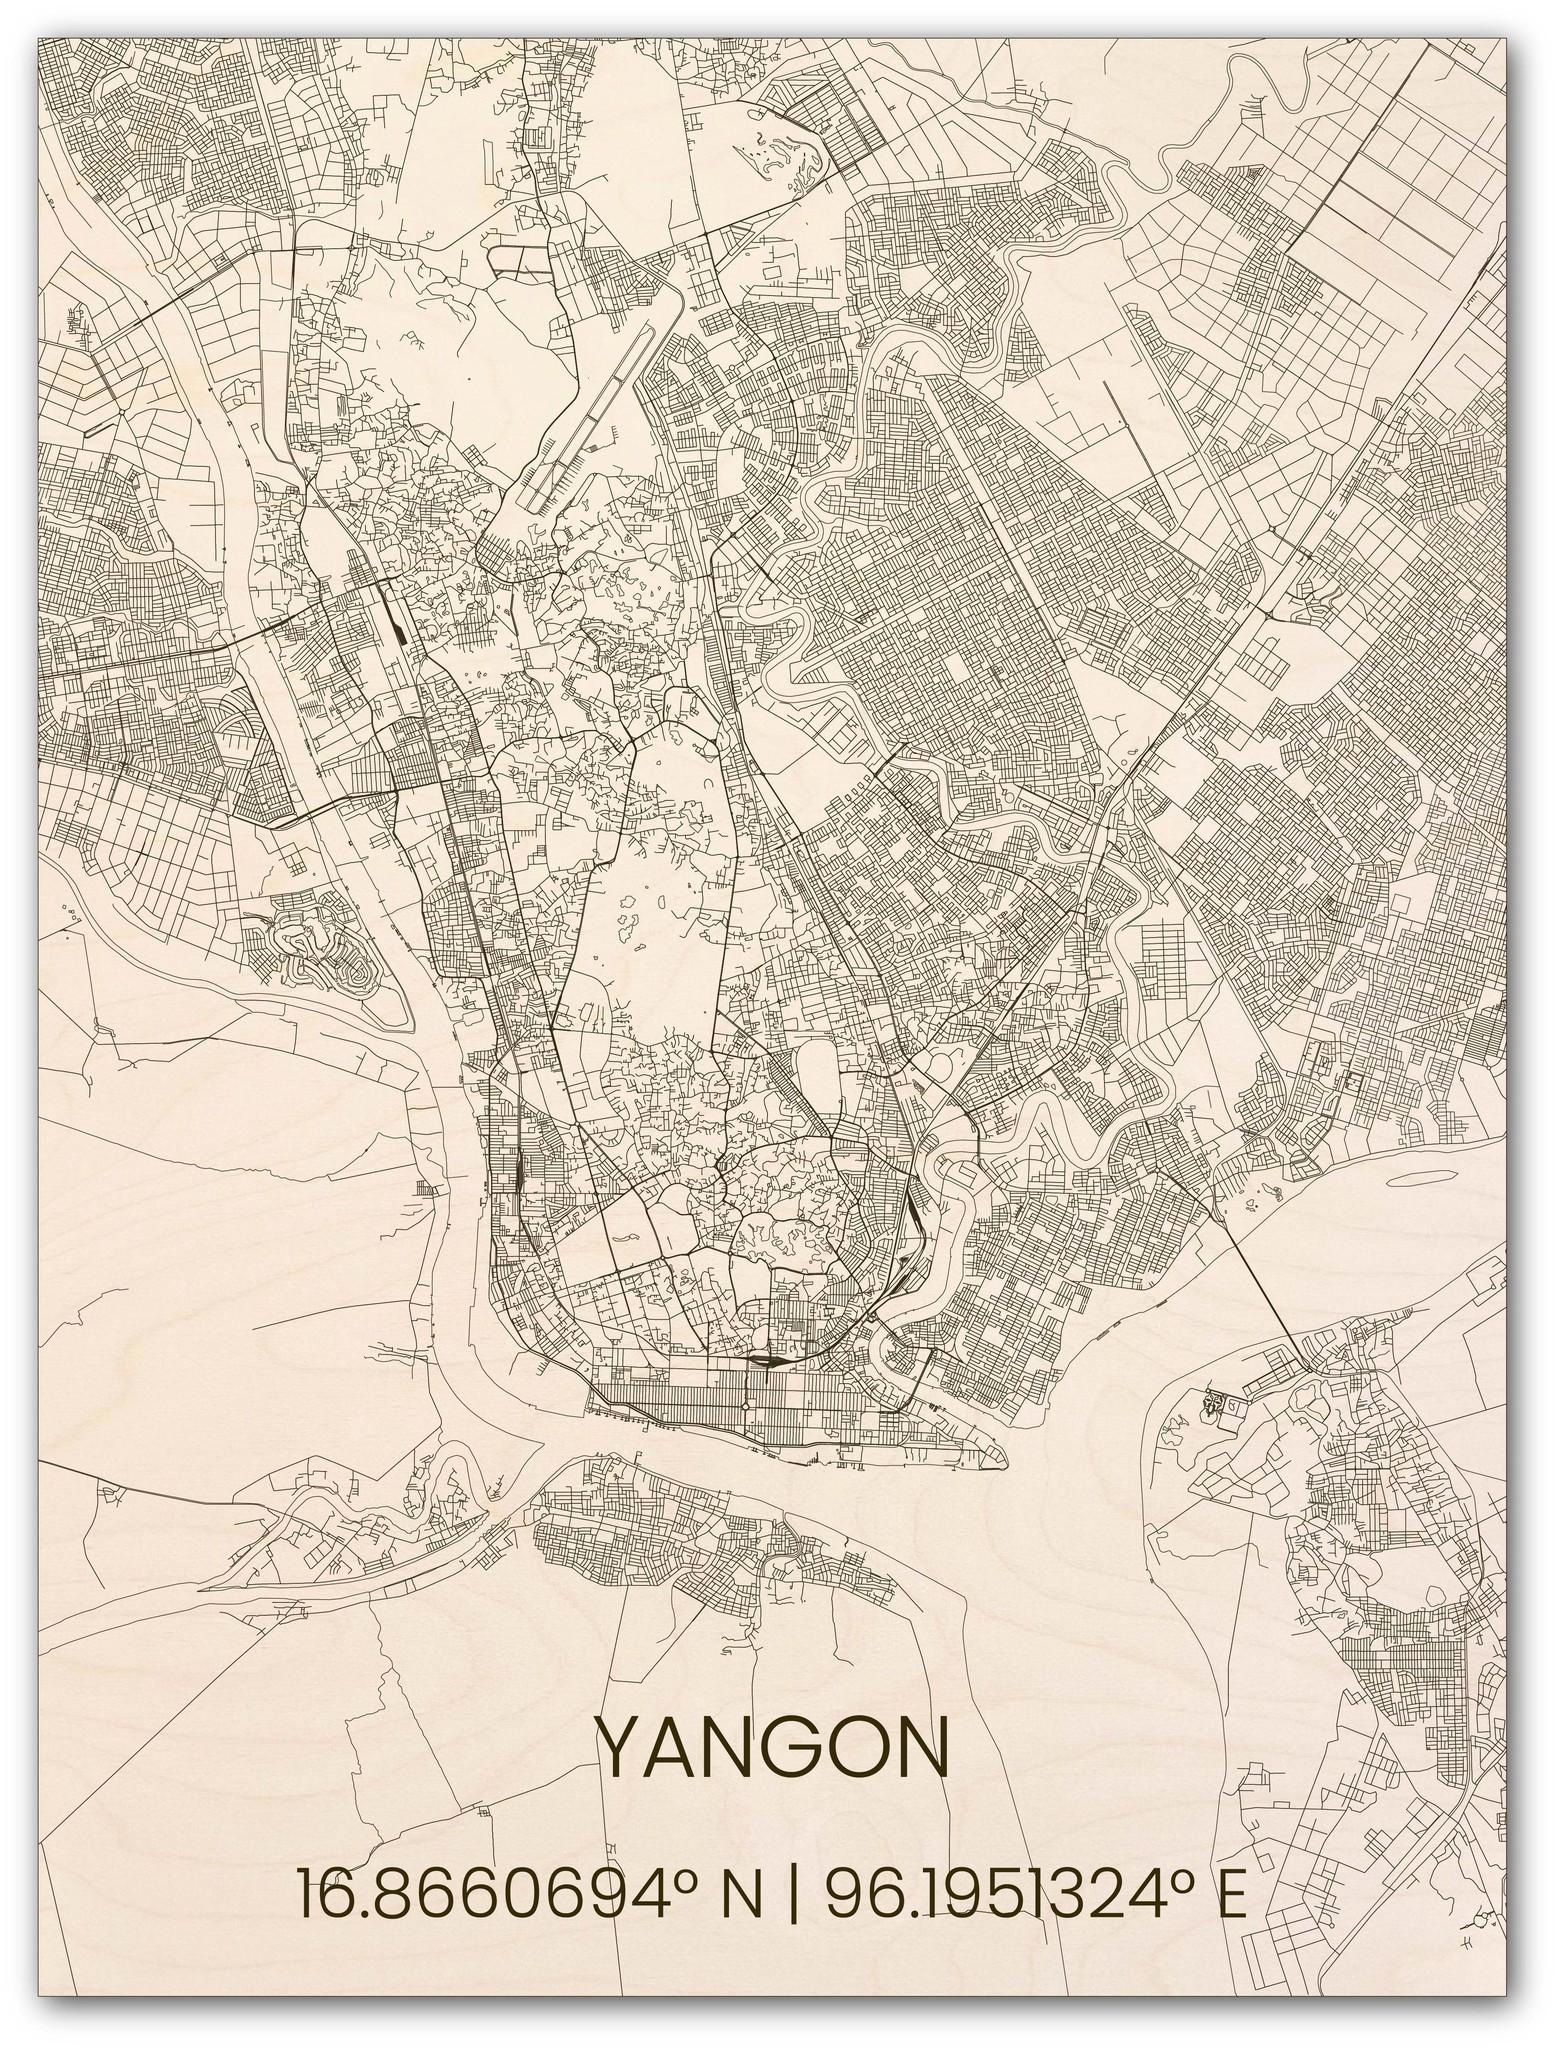 Houten stadsplattegrond Yangon-1